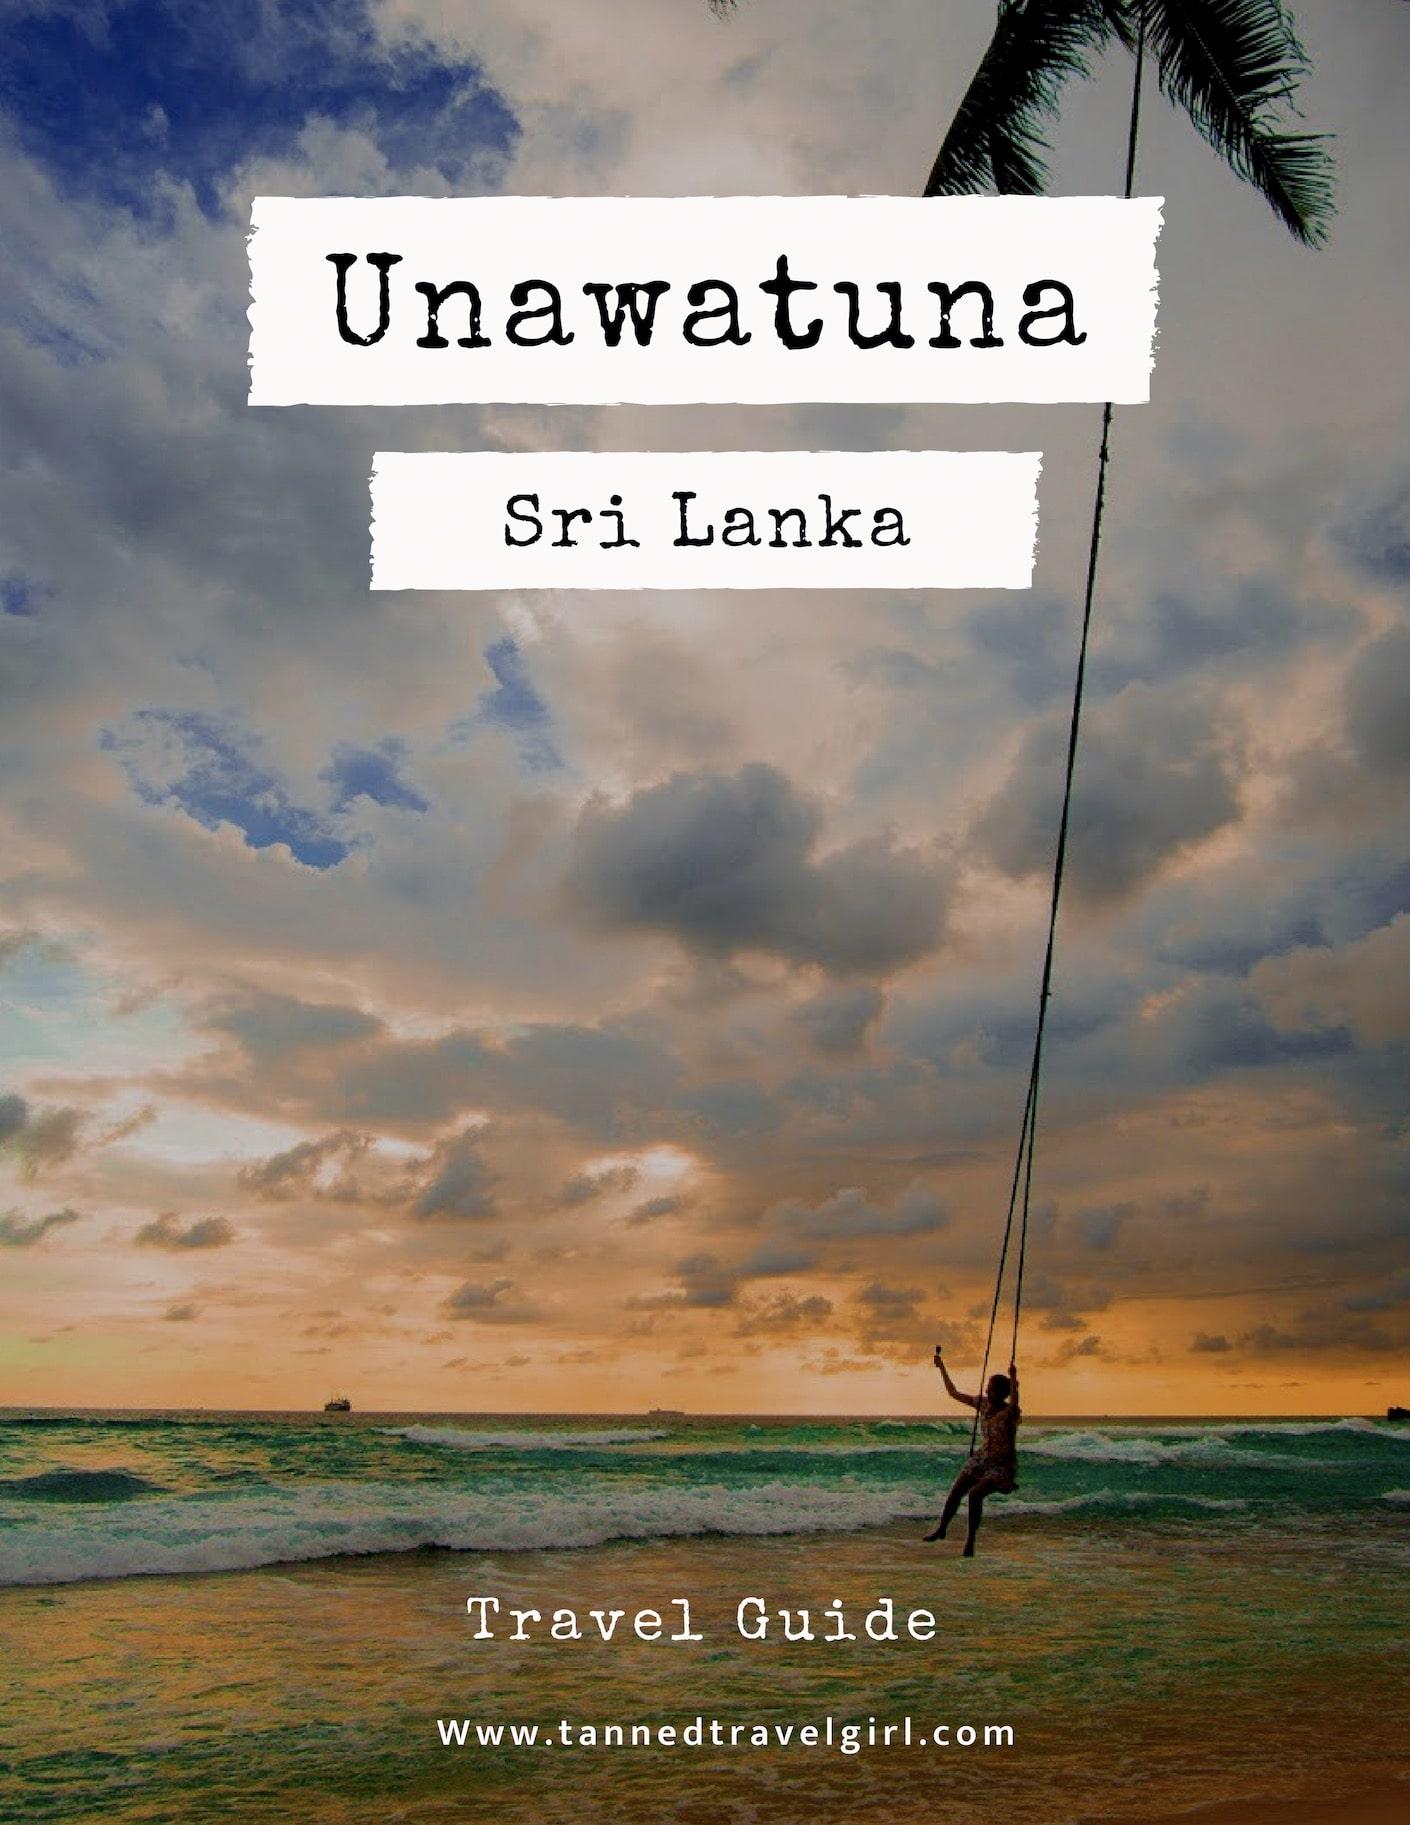 Lanka travel book sri guide